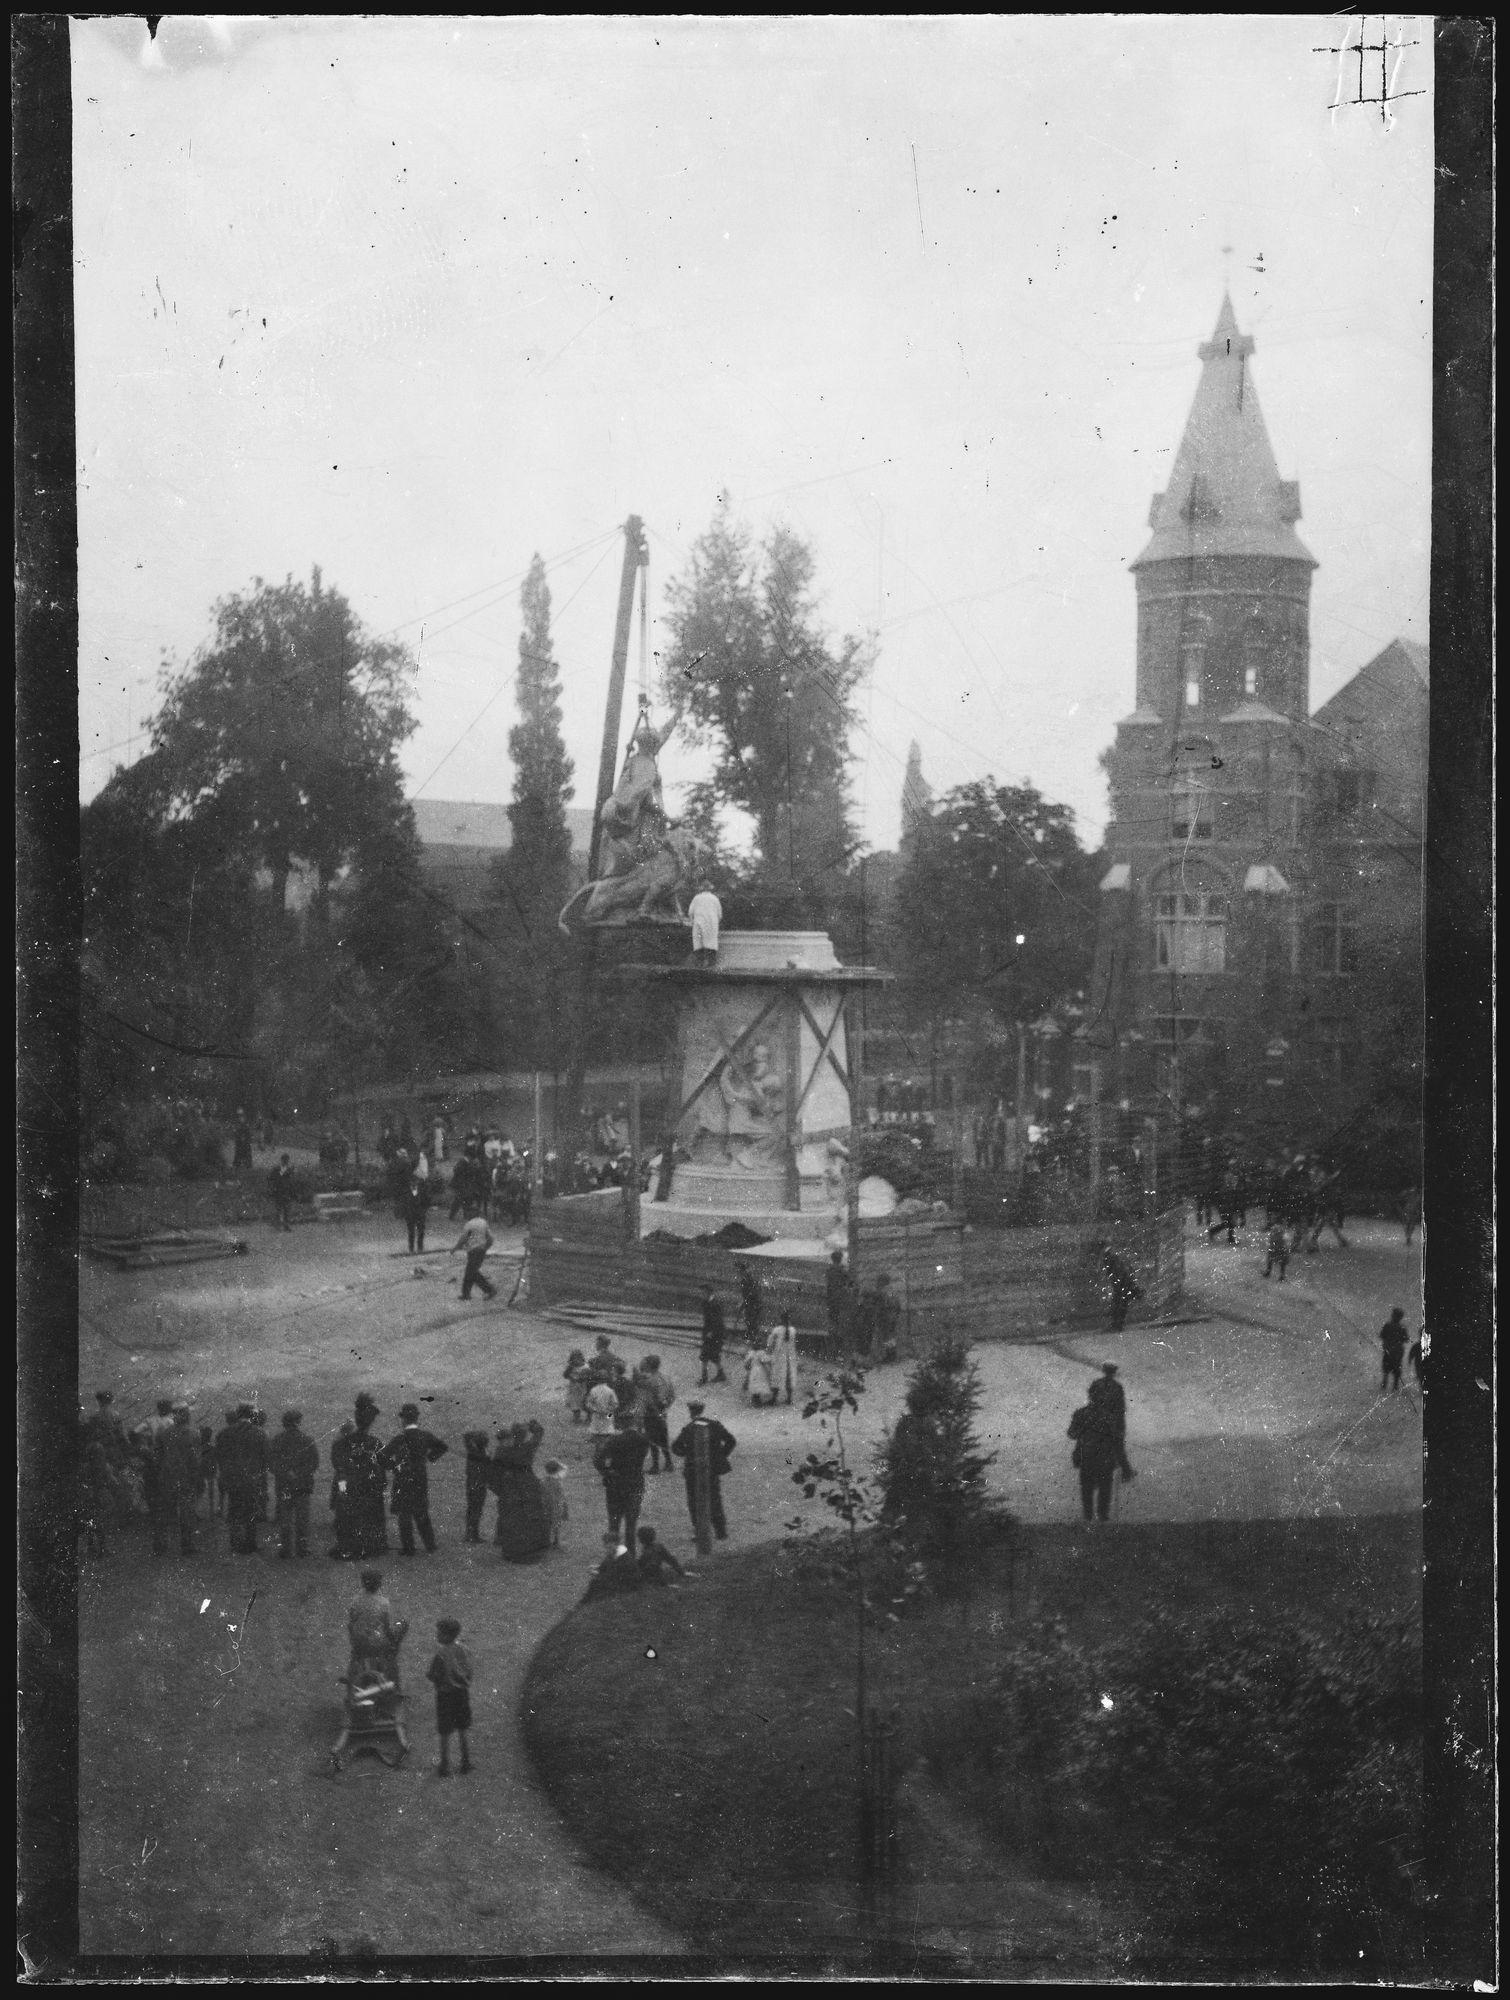 Oprichting Groeningemonument in 1906